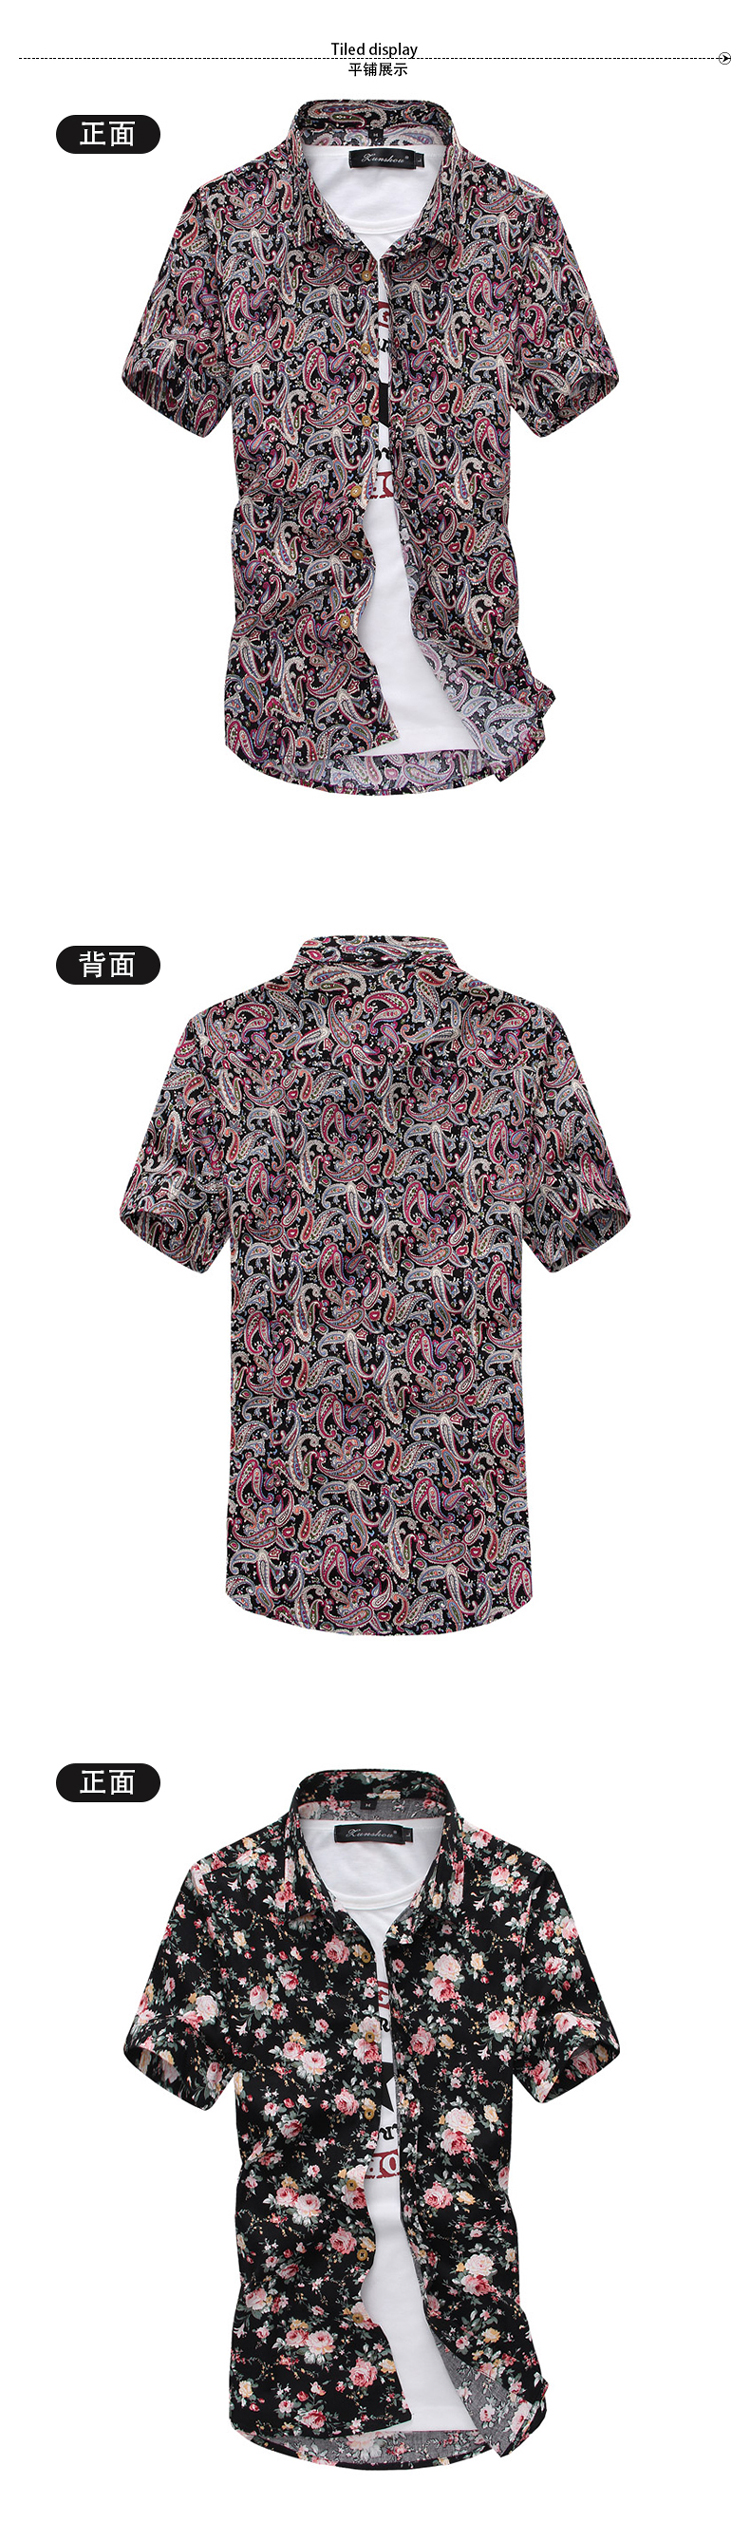 Men Summer Thin Shirts Short Sleeve Floral Shirts New Fashion Men Outwear Casual Slim Shirts Mens Cotton dress shirts 12 Online shopping Bangladesh